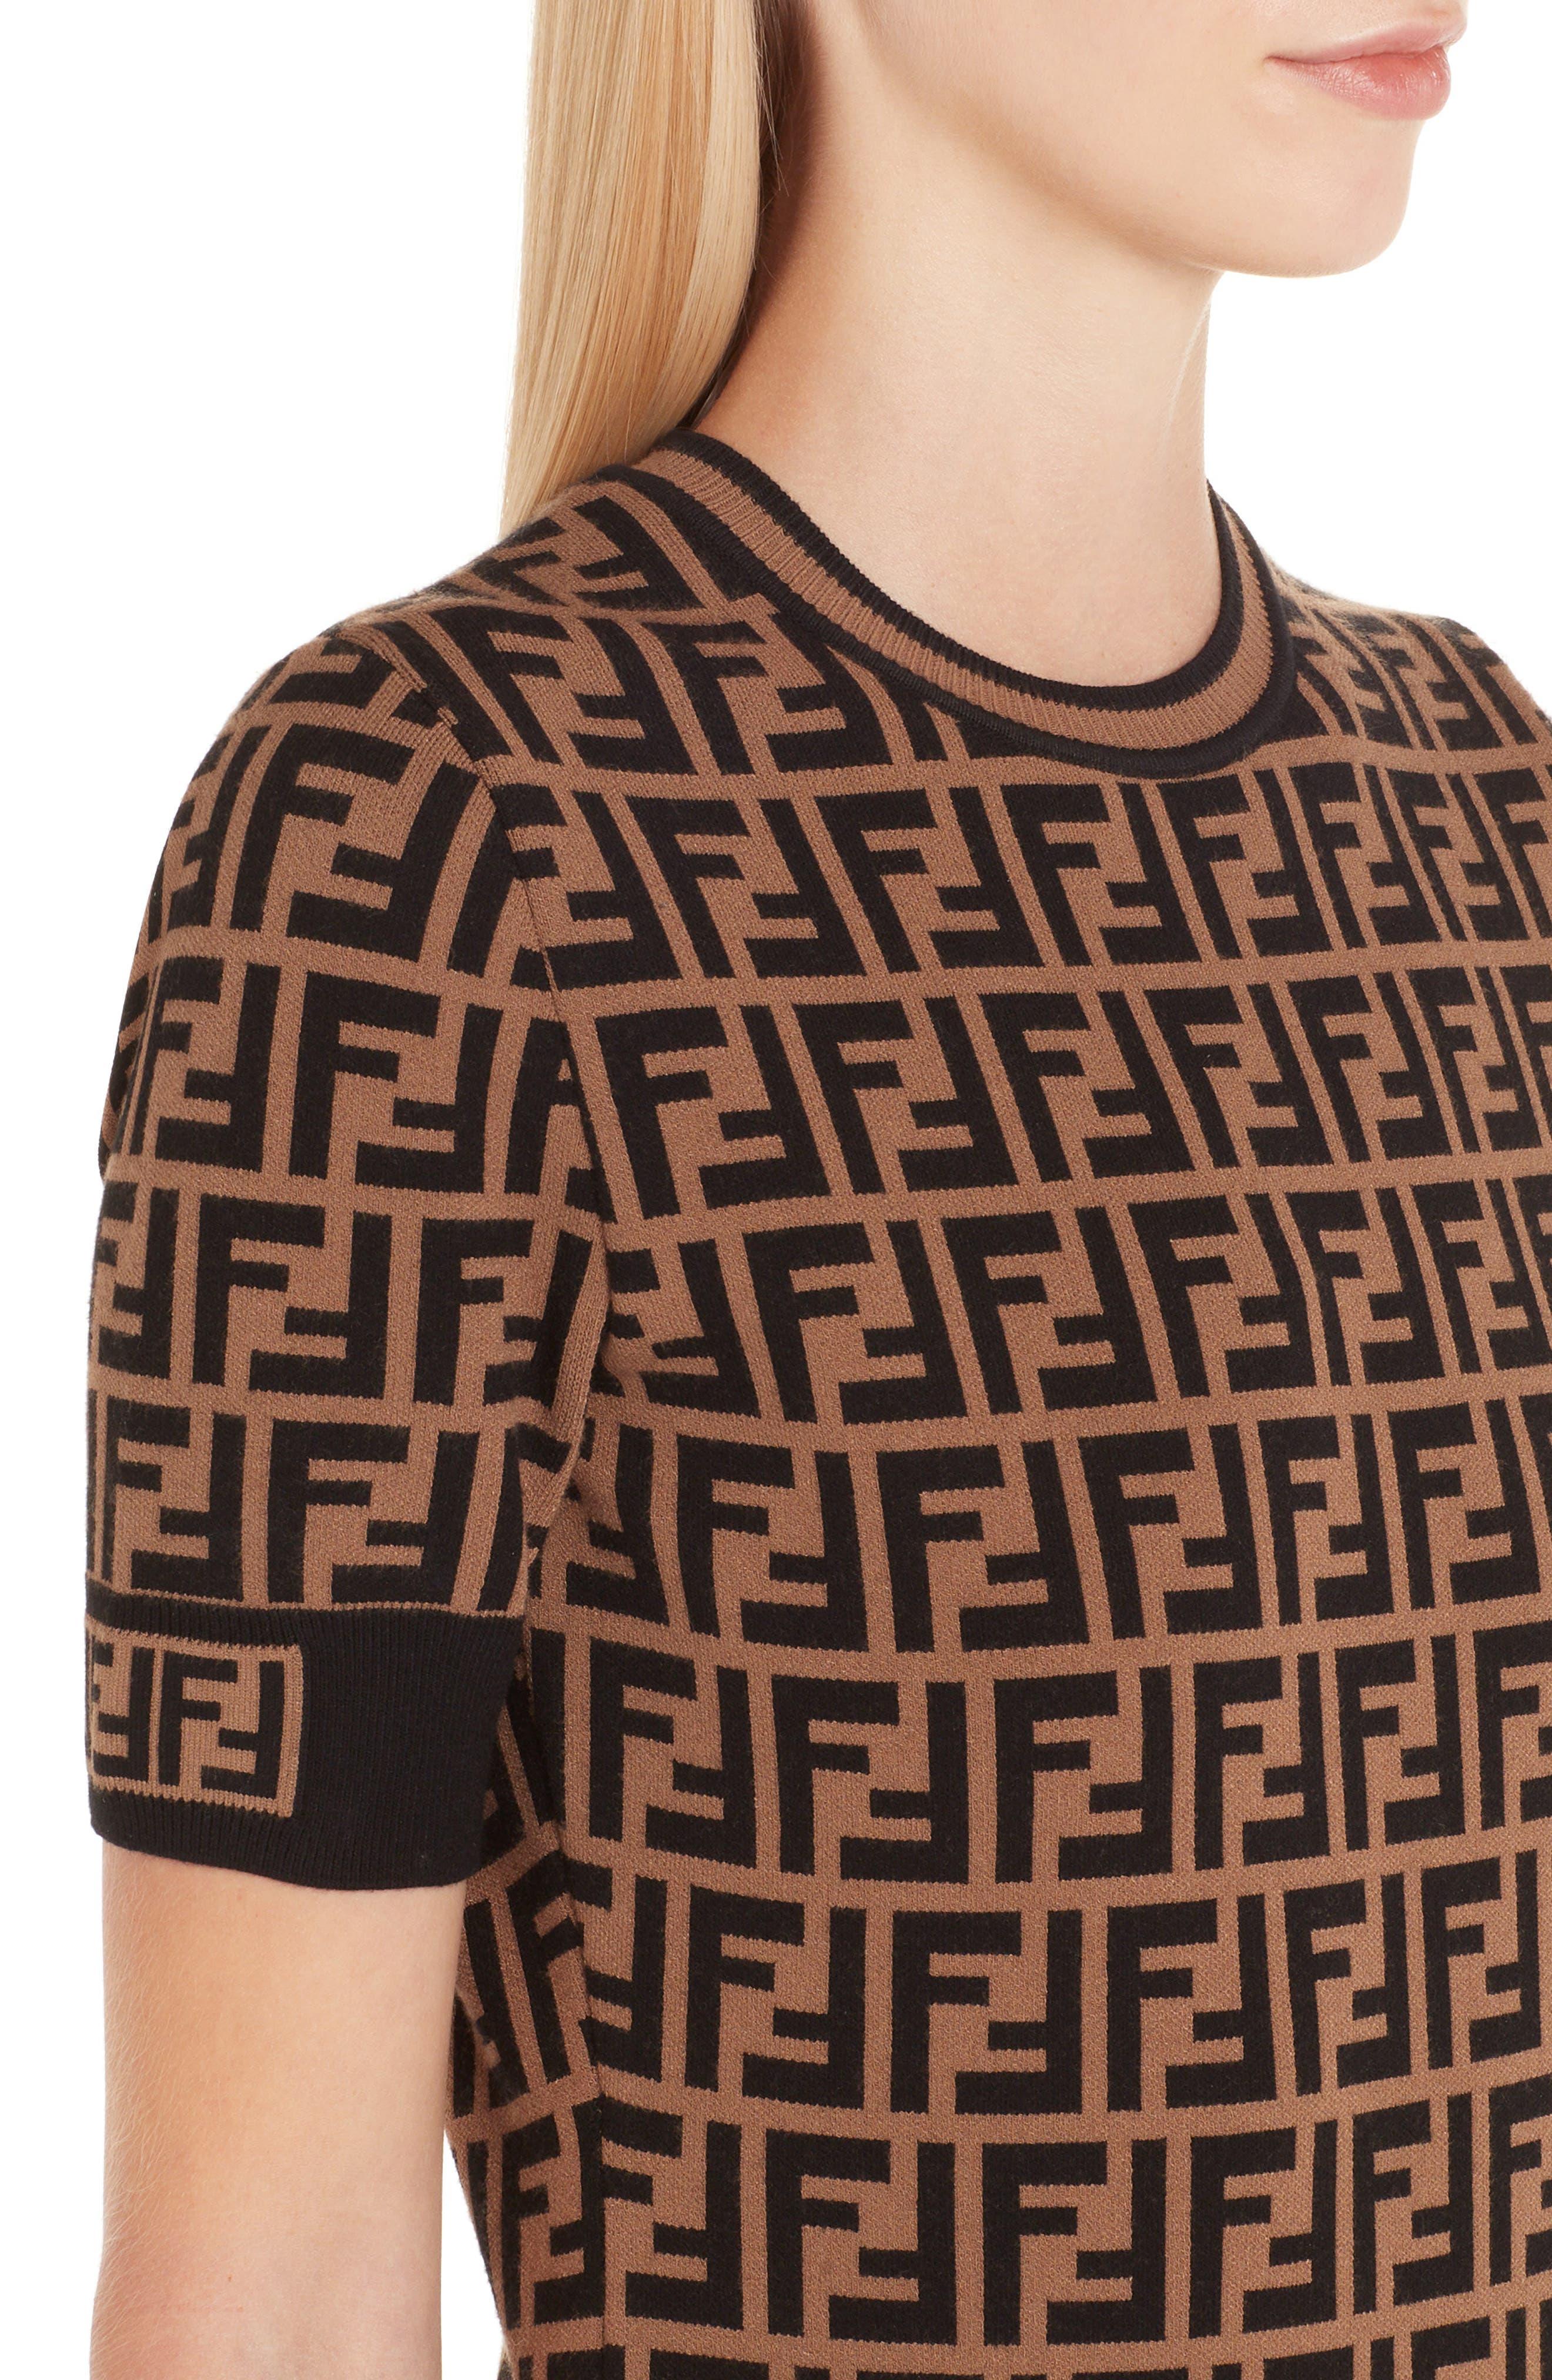 FF Logo Knit Dress,                             Alternate thumbnail 4, color,                             230